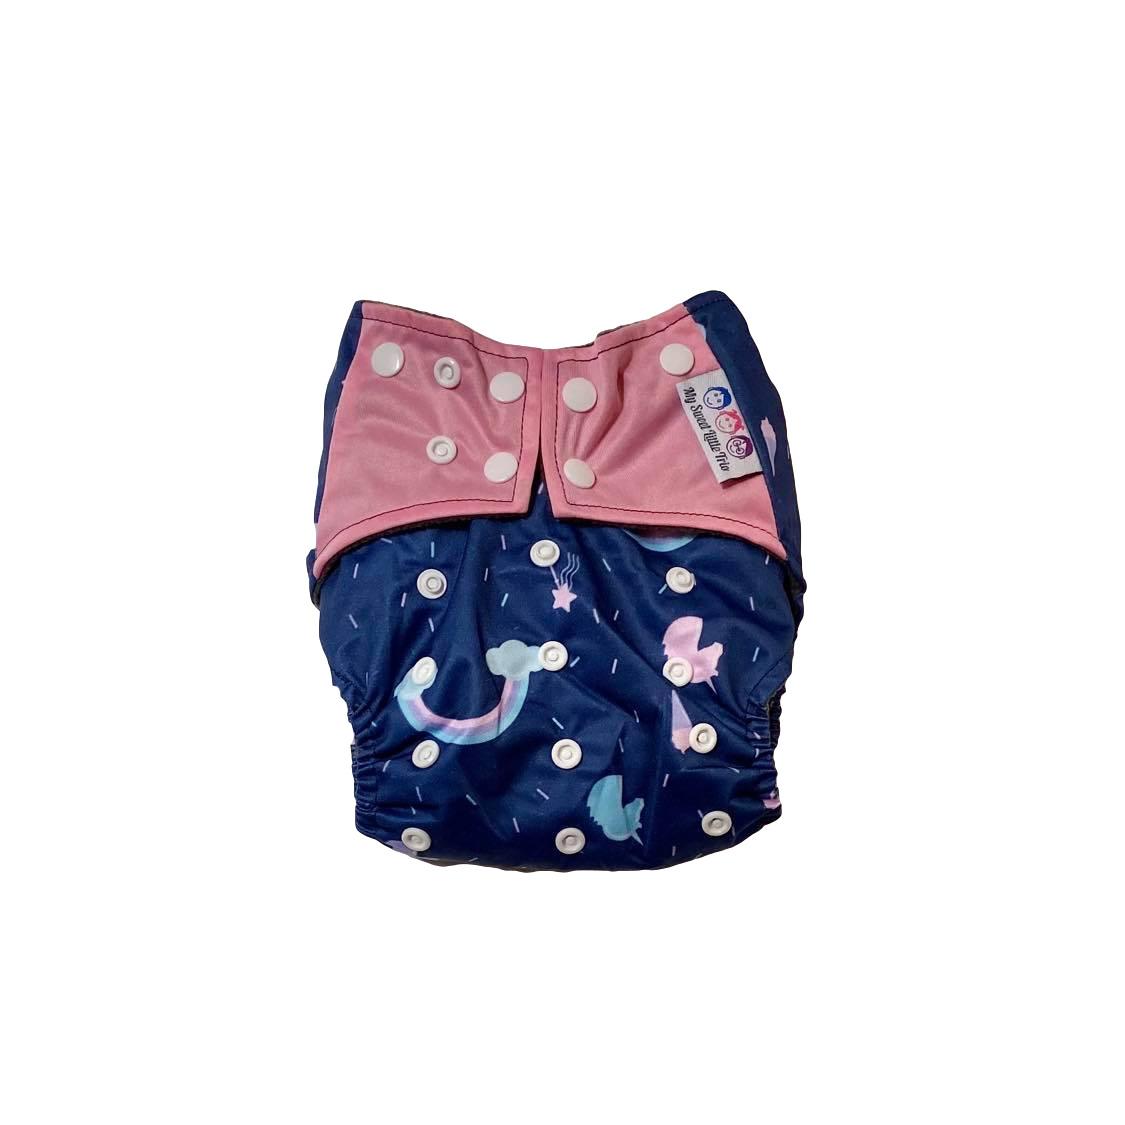 cloth nappies - Unicorn | Trada Marketplace